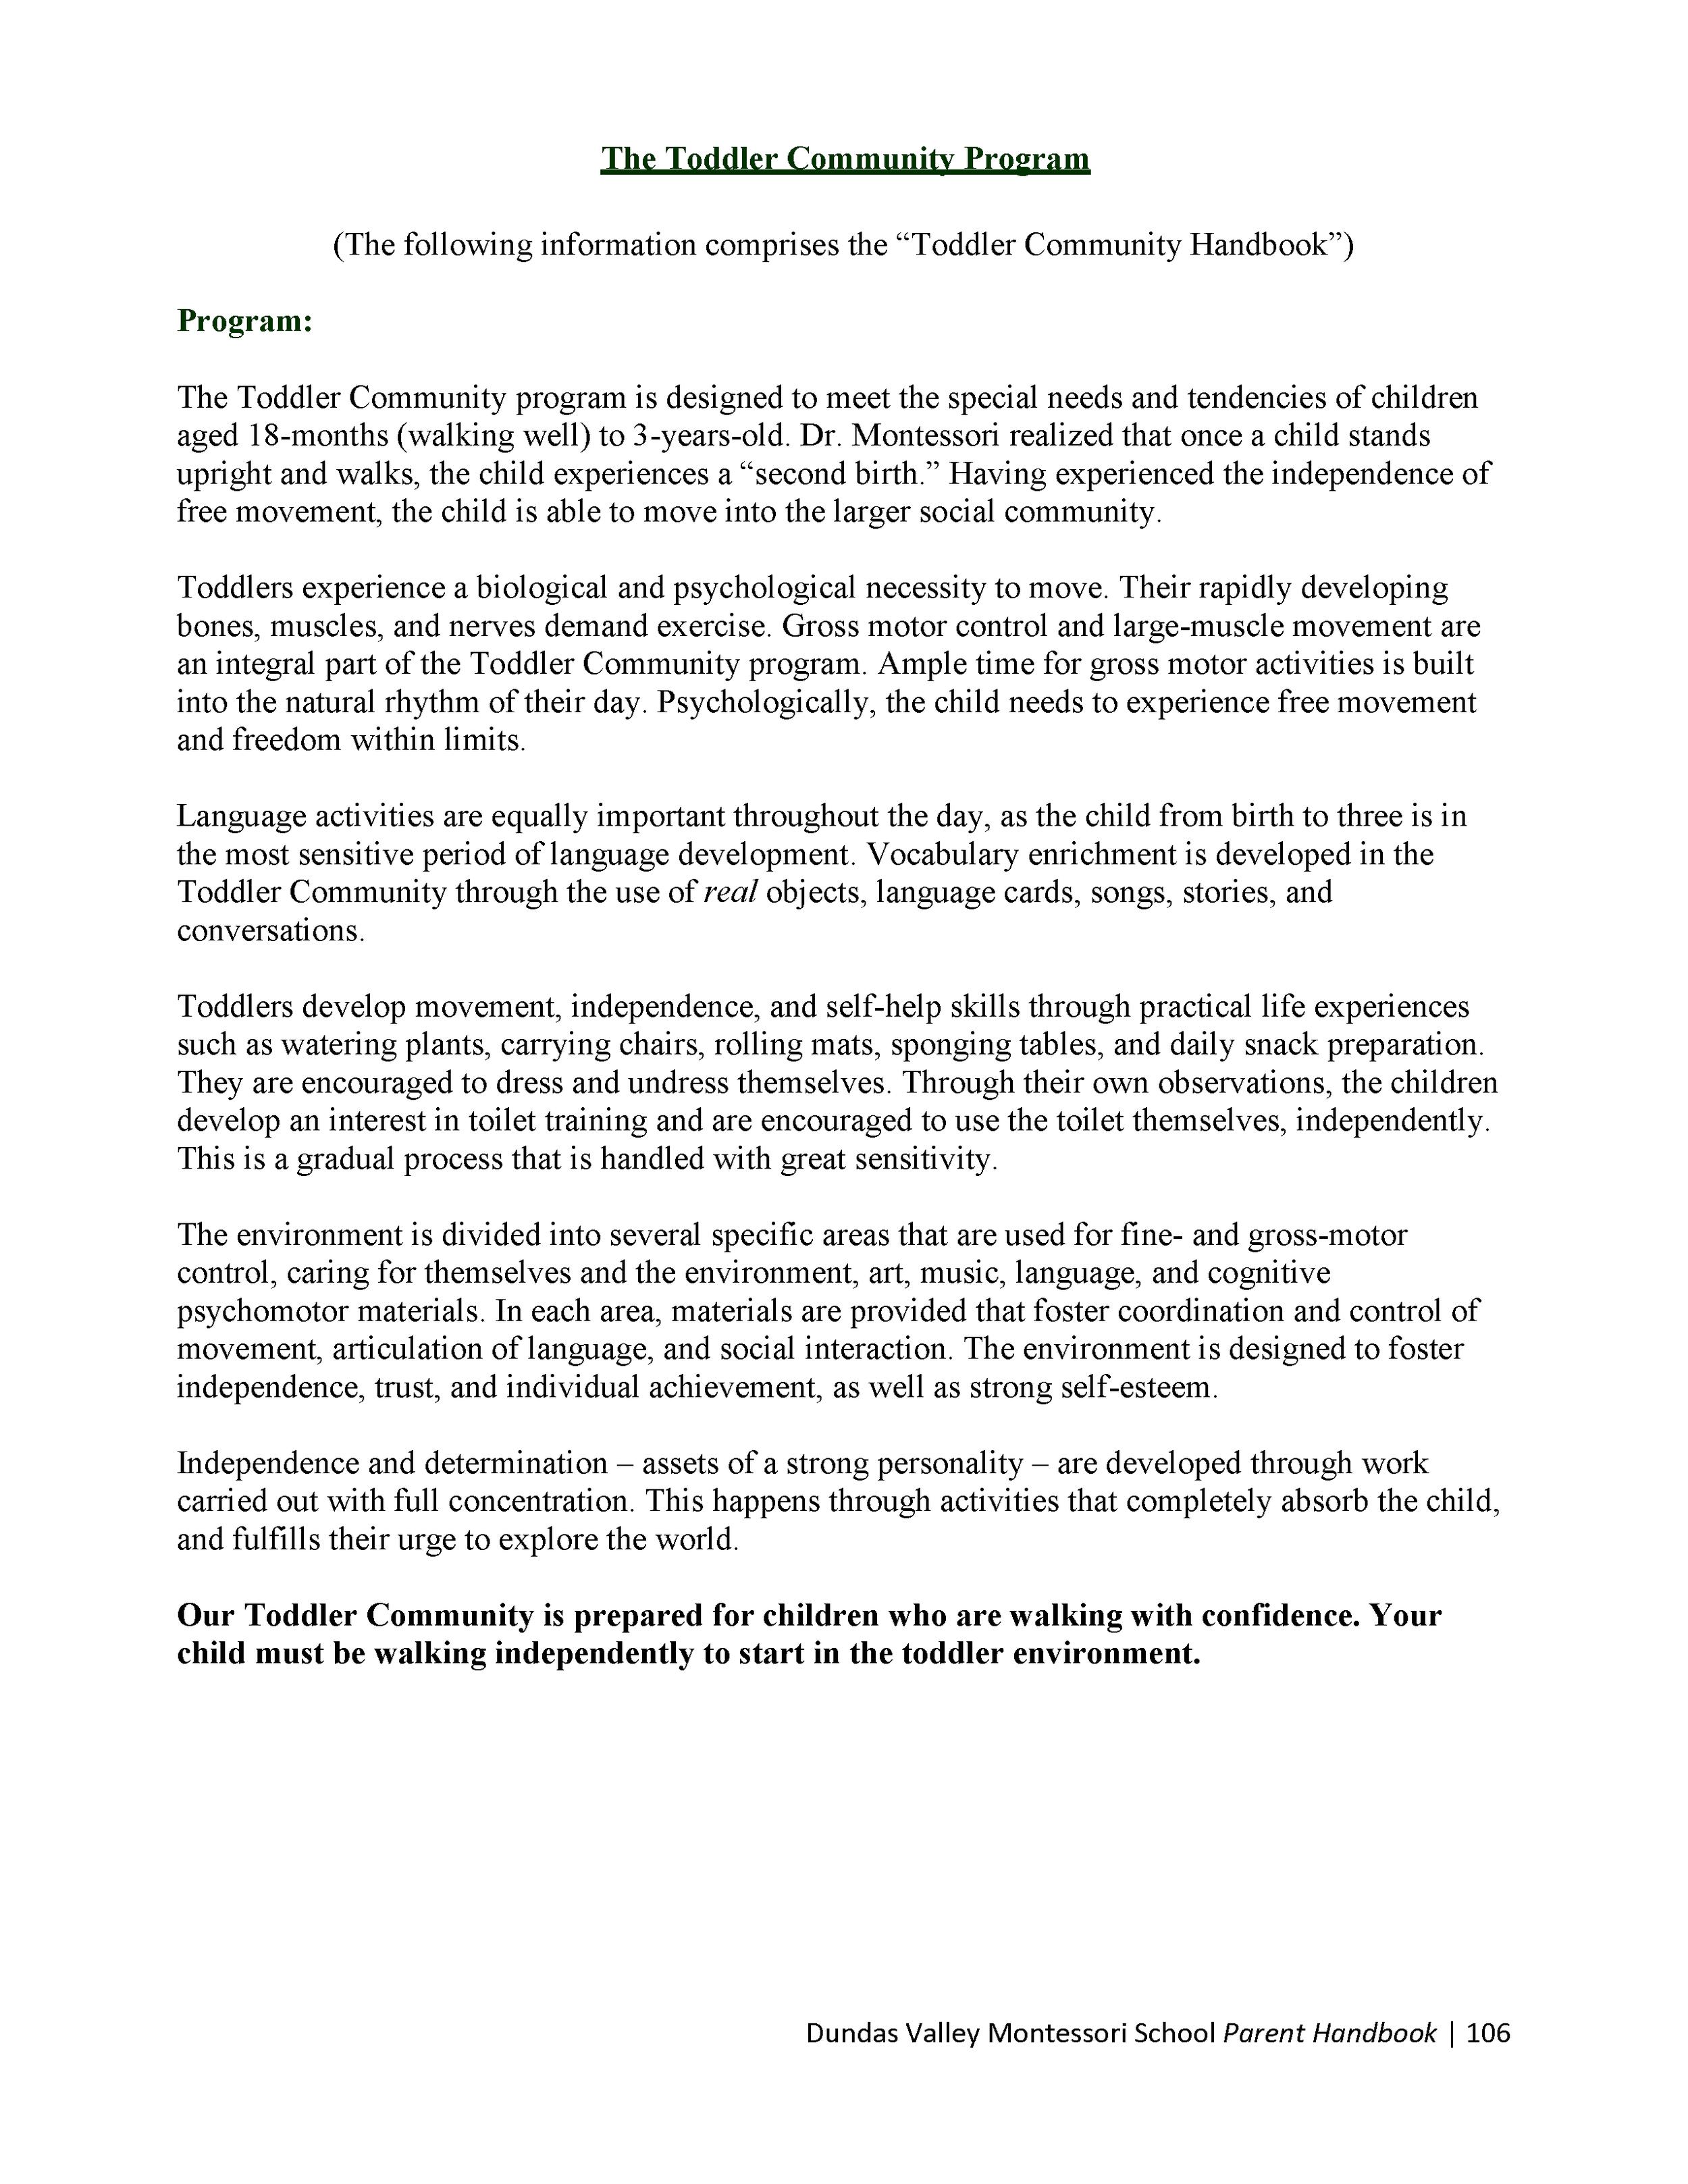 DVMS-Parent-Handbook-19-20_Page_108.png